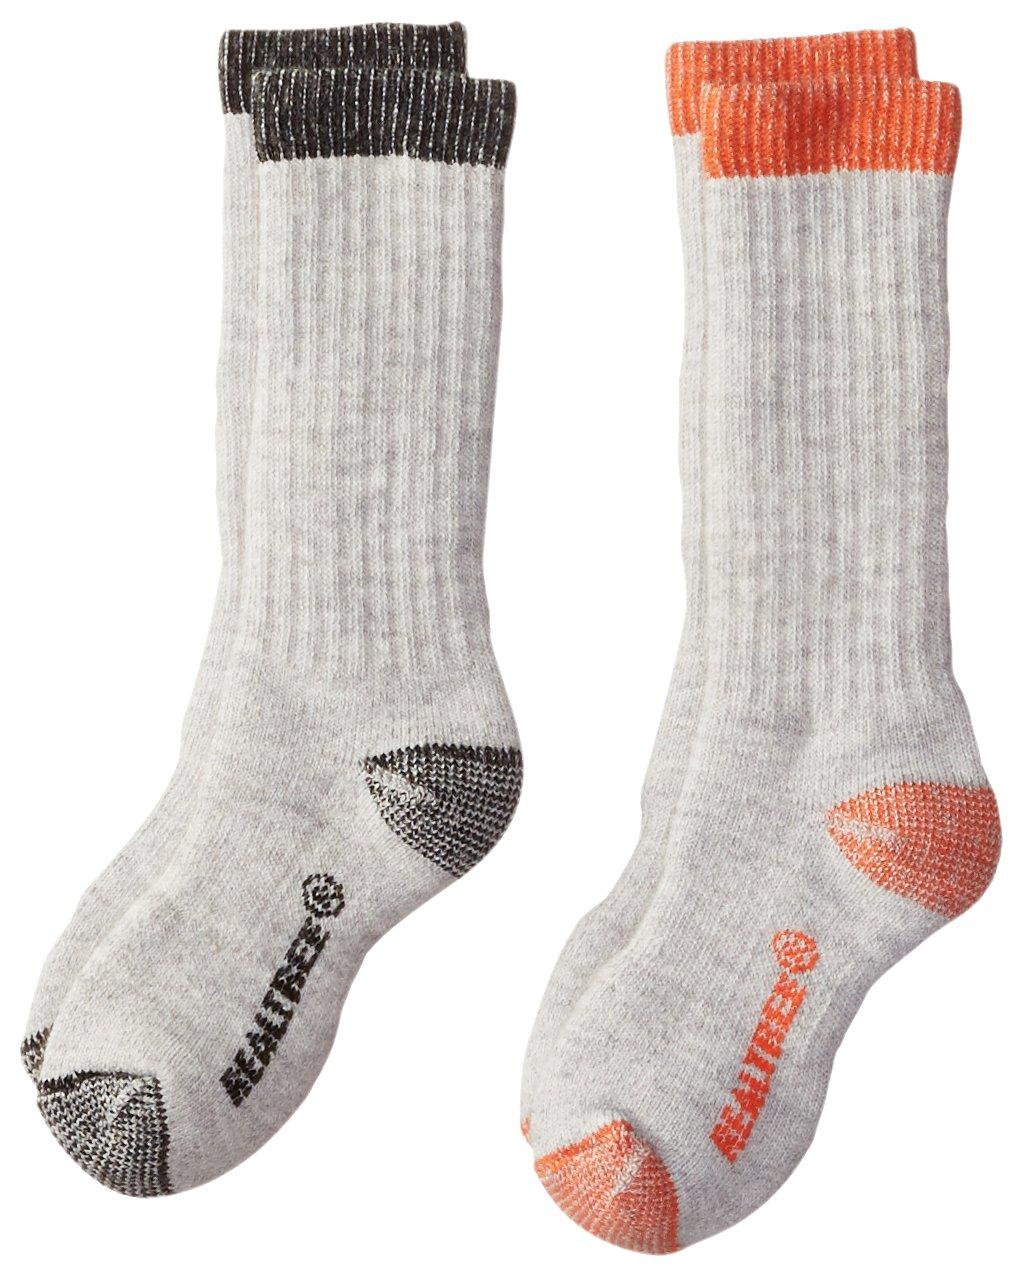 Realtree Boys Merino Boot Socks Pack (2 Pair), Assorted Colors, Small Carolina Hoisery 2/578